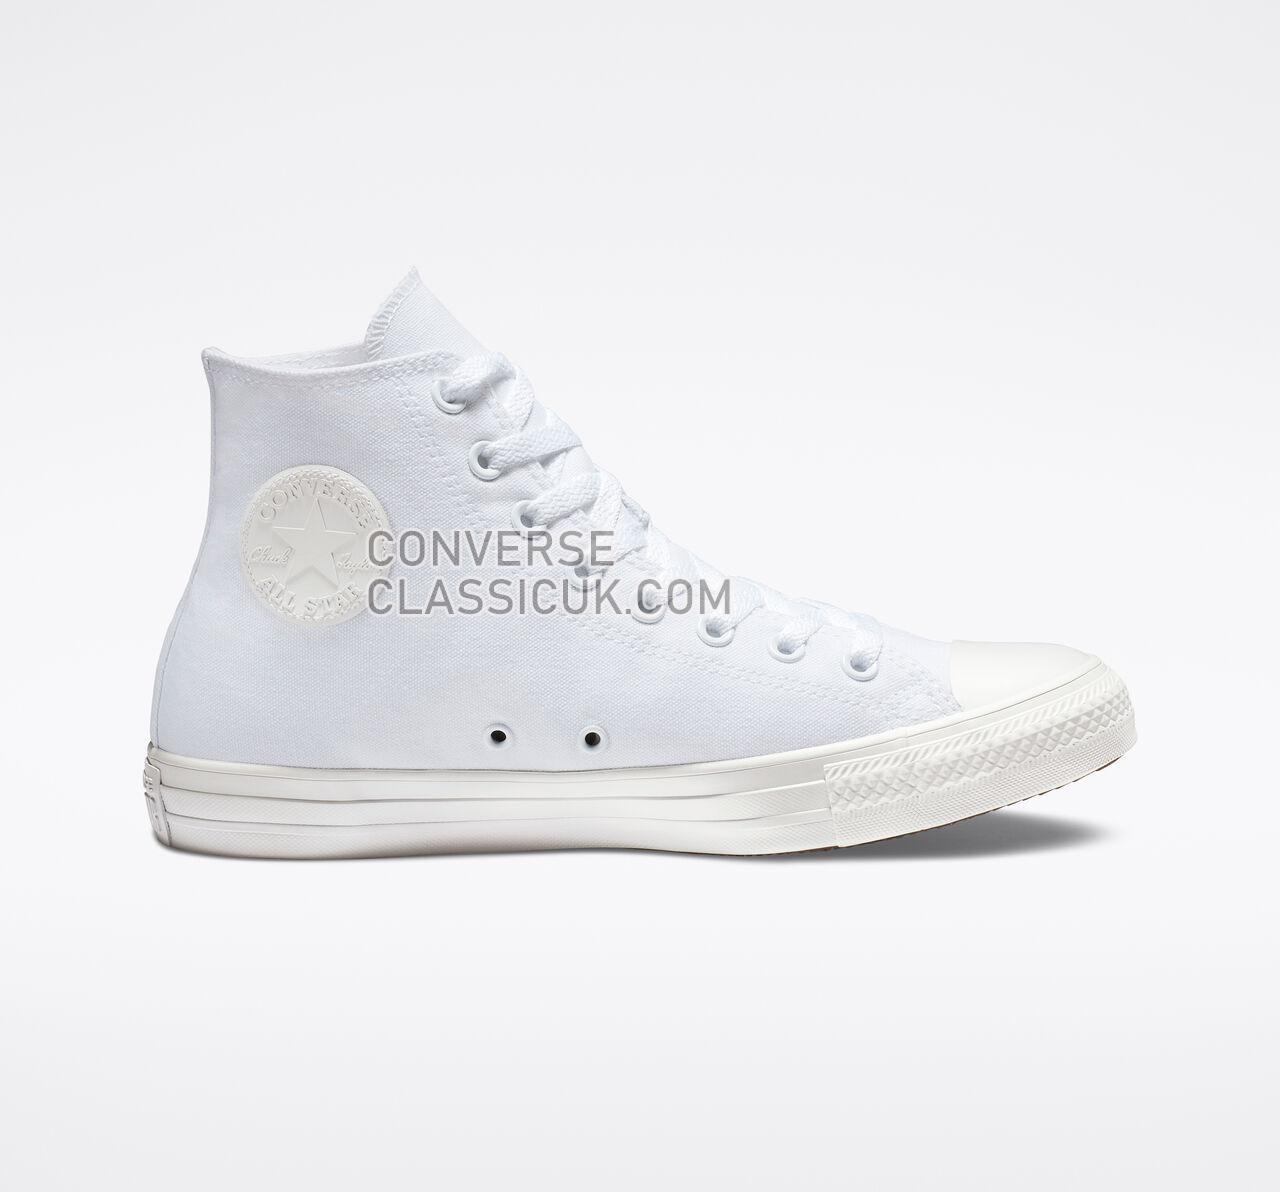 Converse Chuck Taylor All Star High Top Mens Womens Unisex 1U646F White Monochrome Shoes